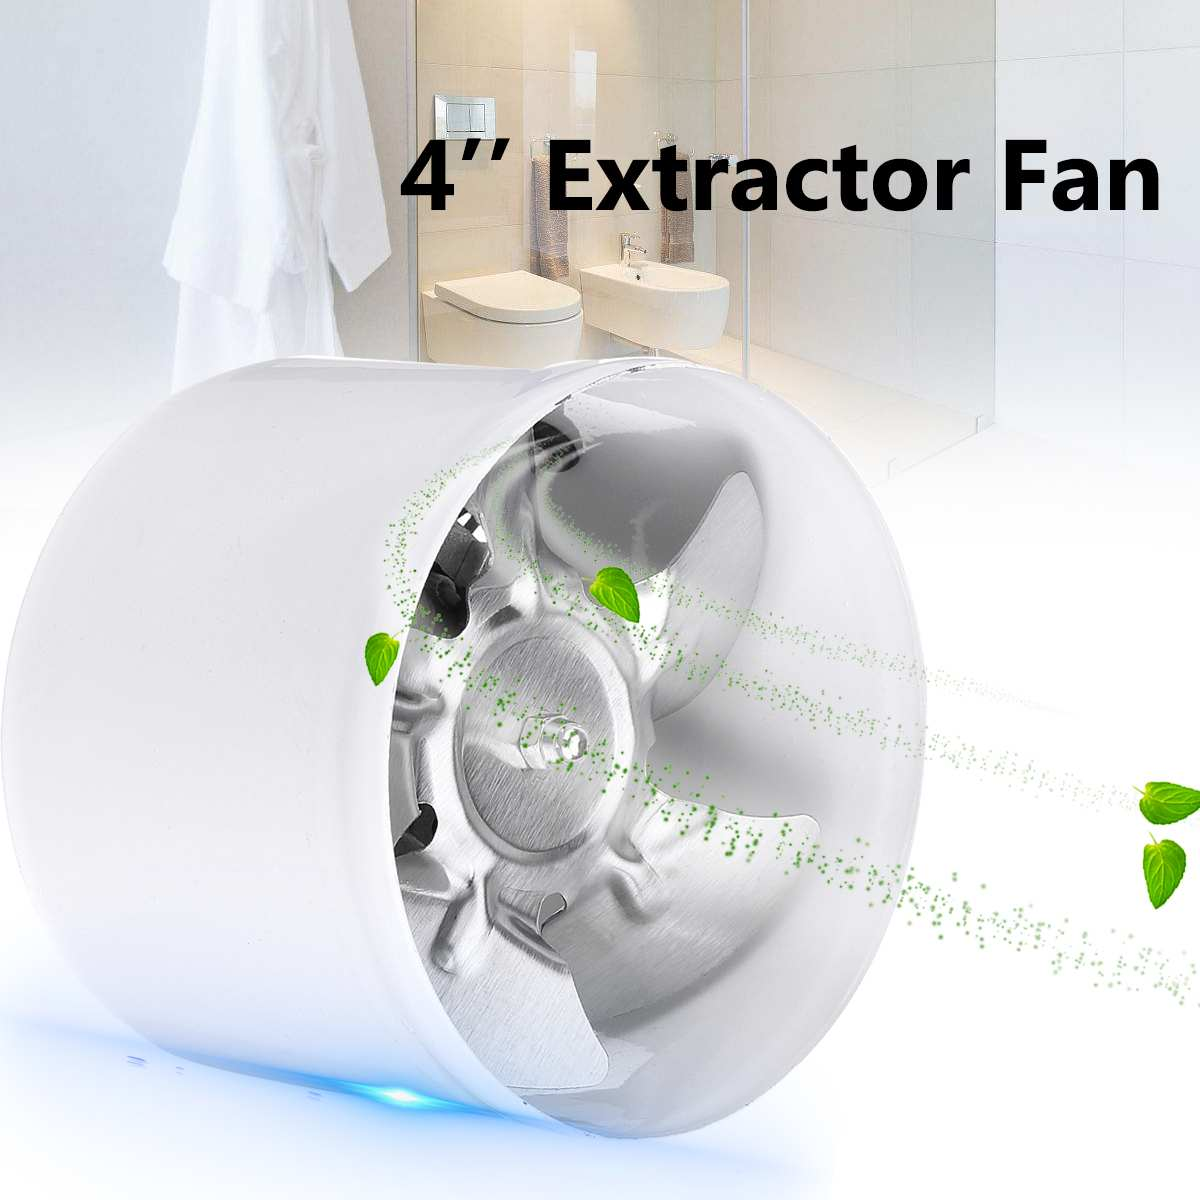 220V 4'' 25W Exhaust Blower Silent Wall Extractor Ventilation Fan Window Bathroom Kitchen Toilet Coo